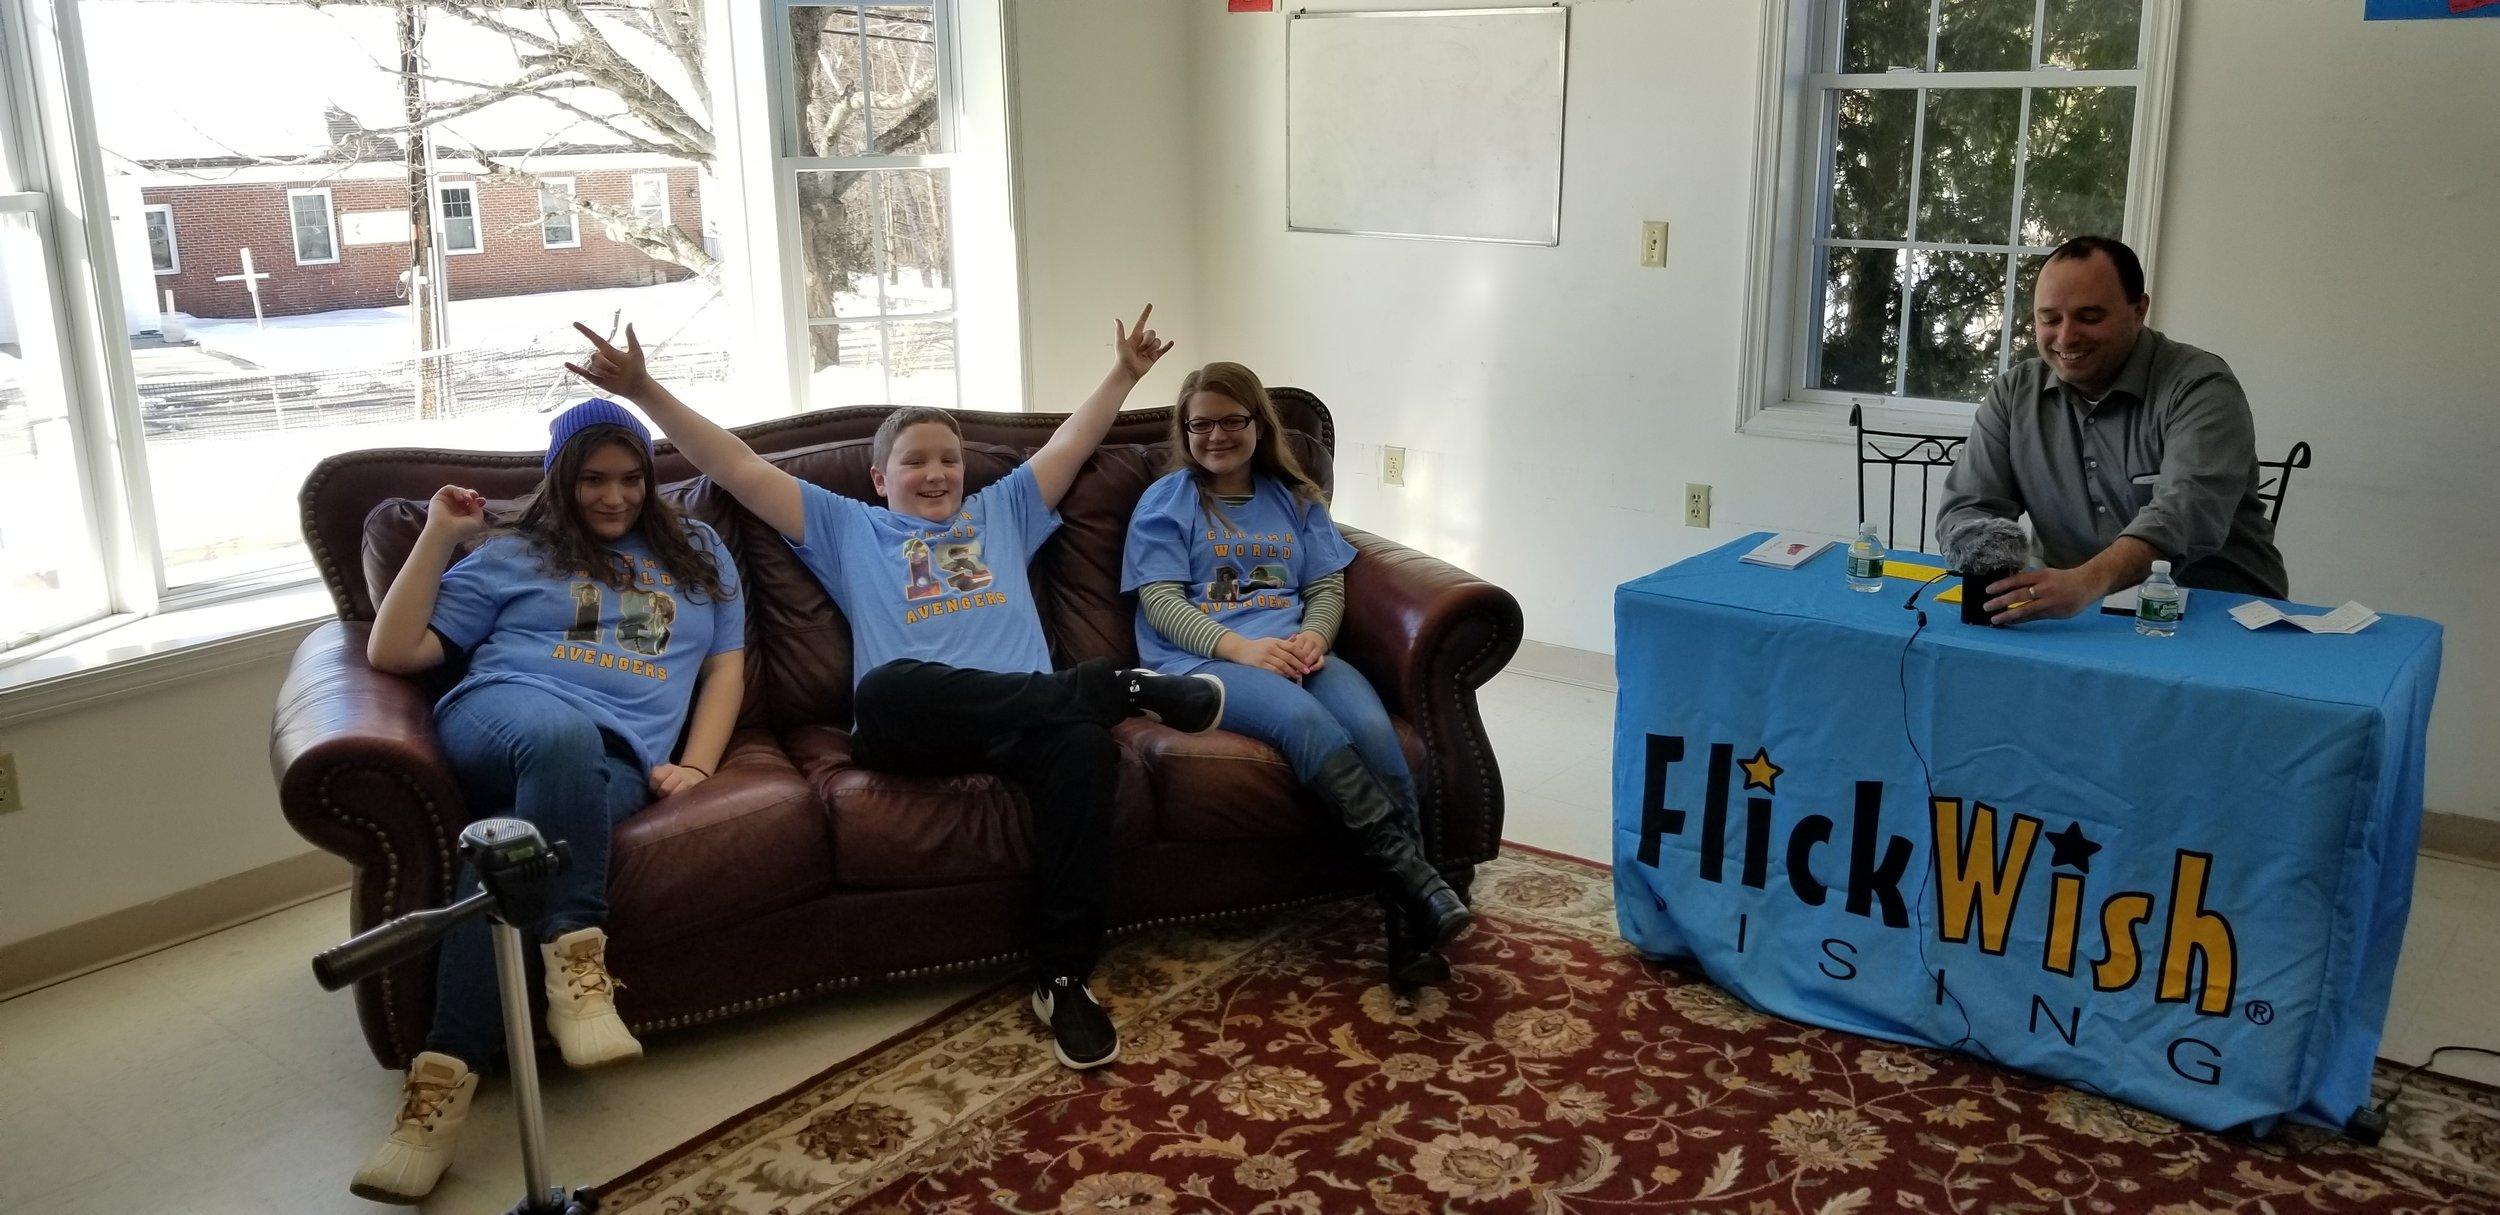 L-R: The FlickWish Family – Bill, Tara, and Brandon Harris